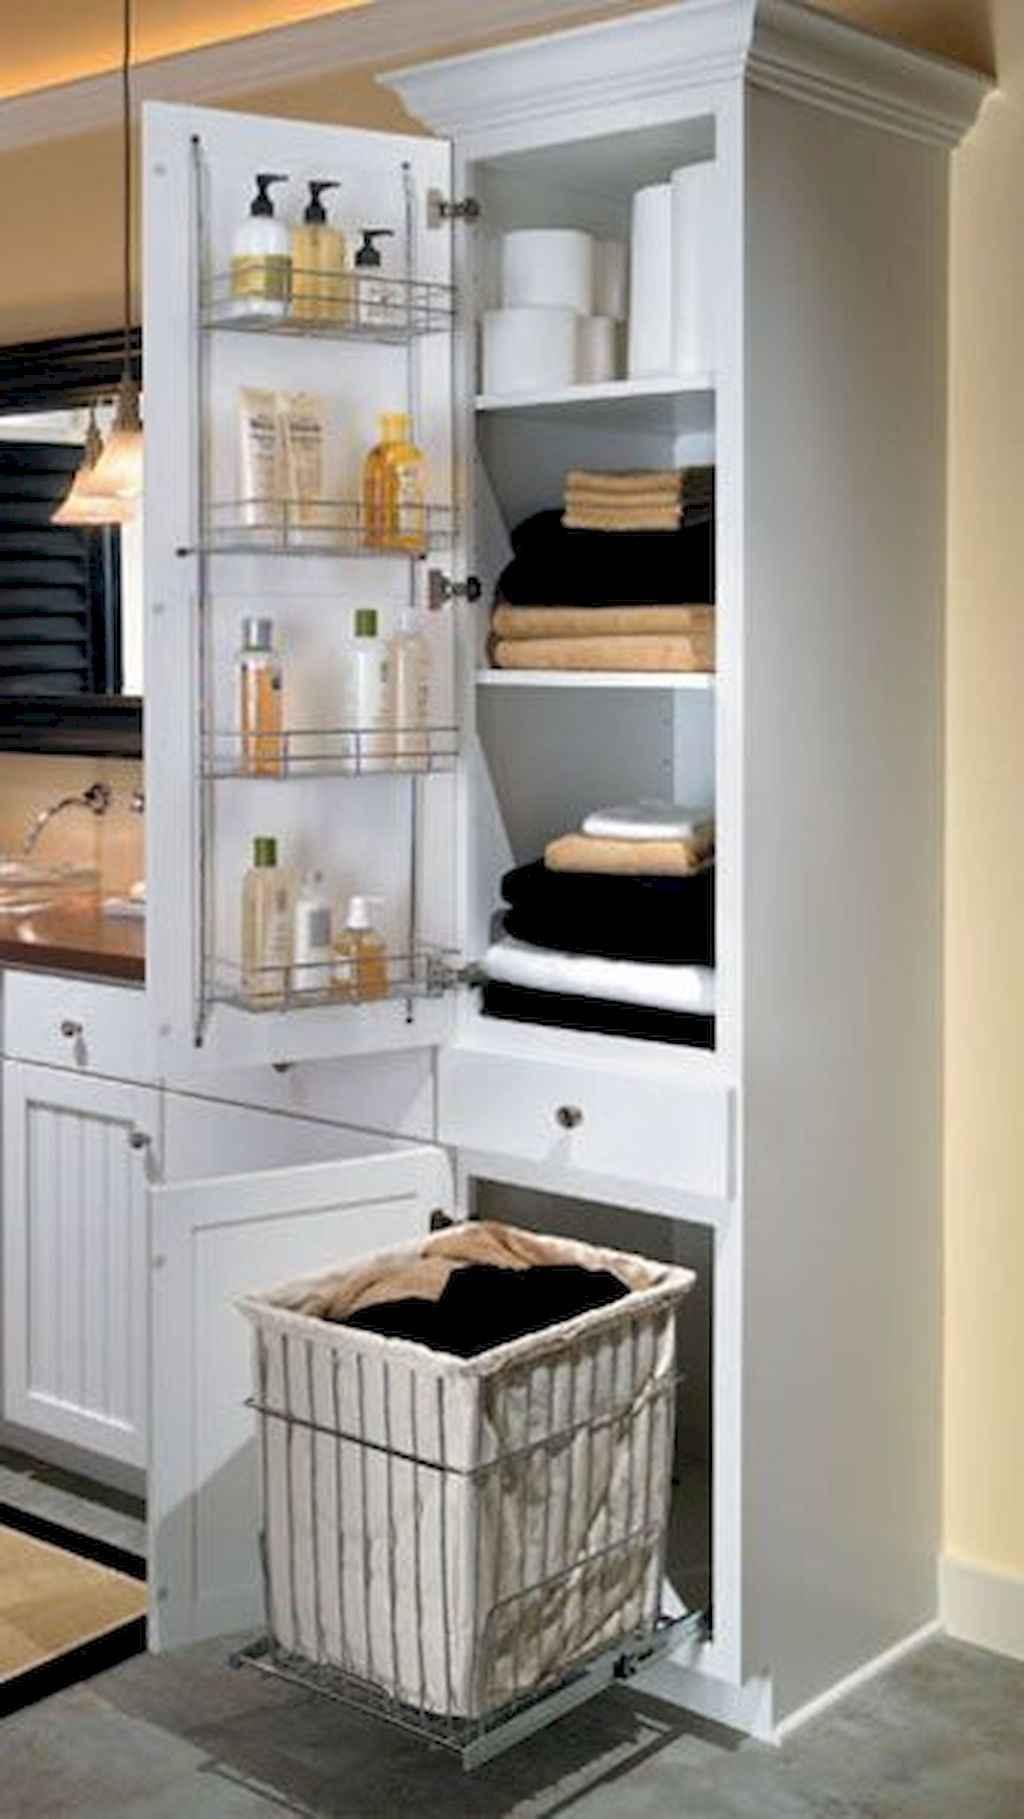 111 Brilliant Small Bathroom Remodel Ideas On A Budget (4)